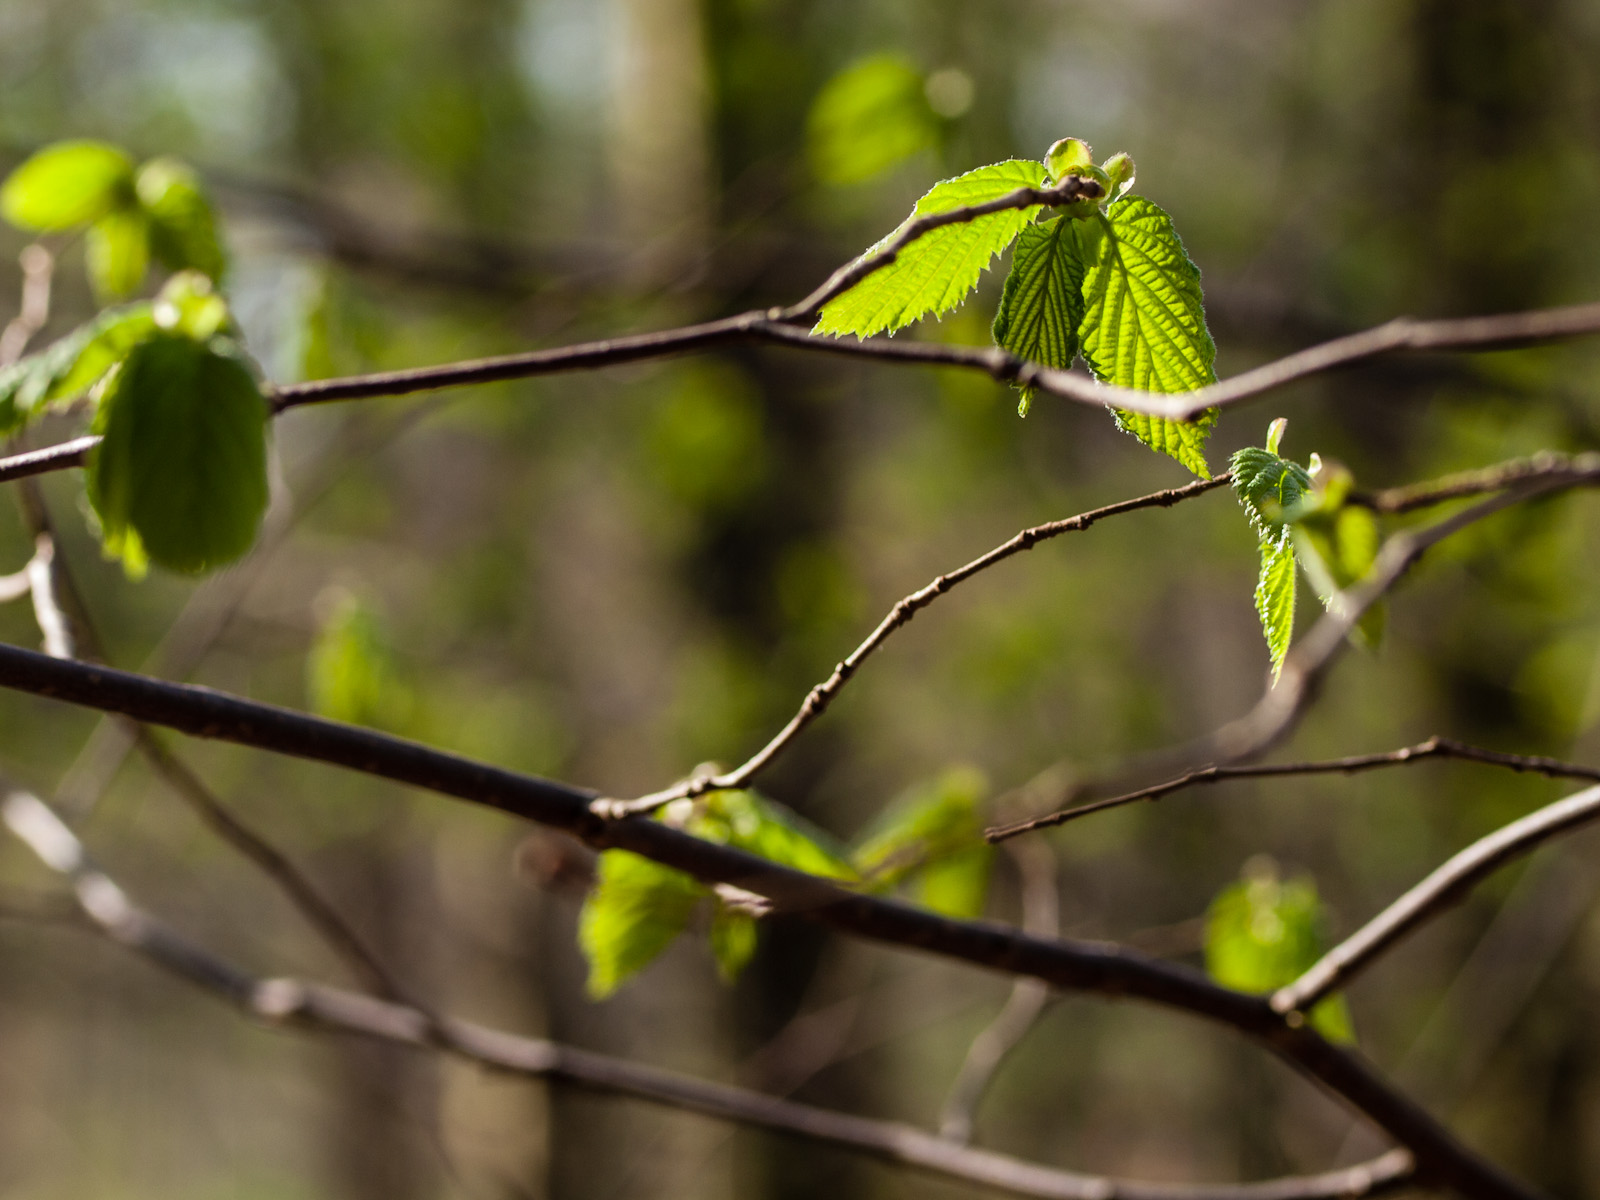 Frühling im BuchenwaldSpring in the beech wood